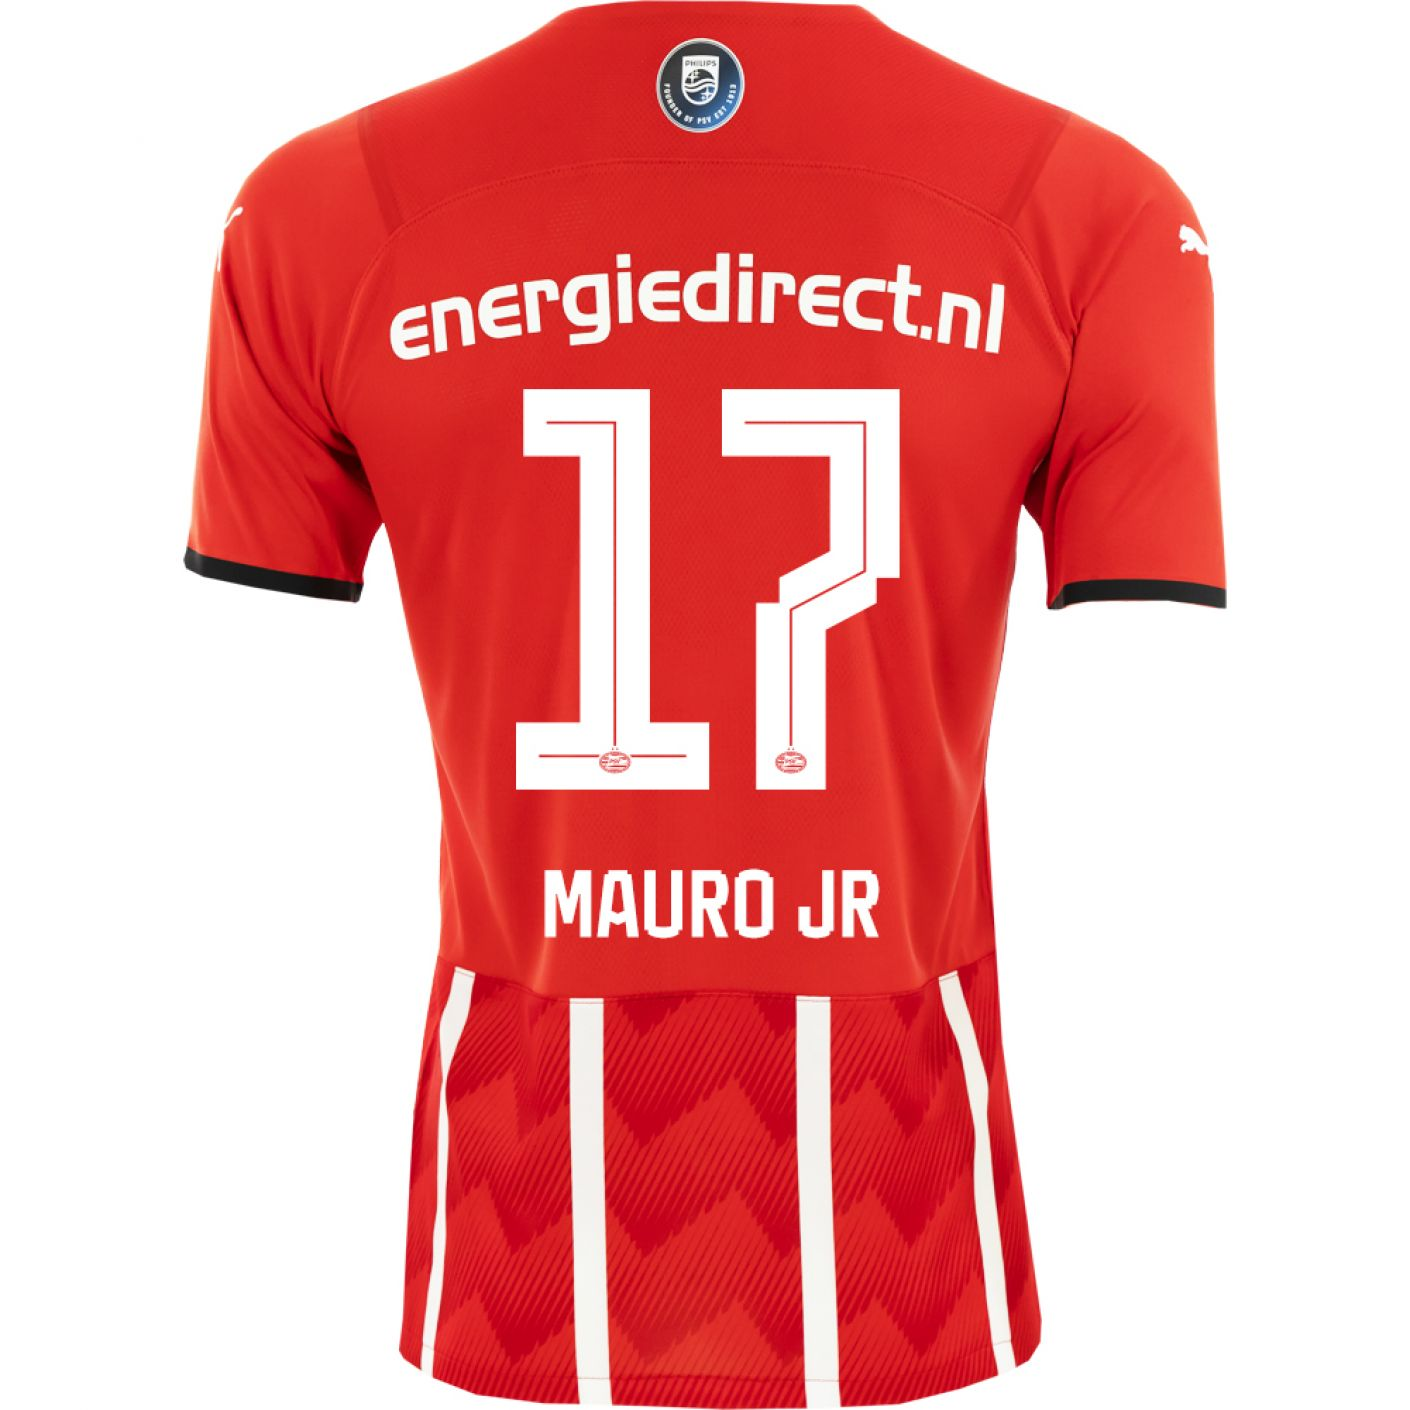 PSV Mauro JR 17 Thuisshirt 21/22 Kids